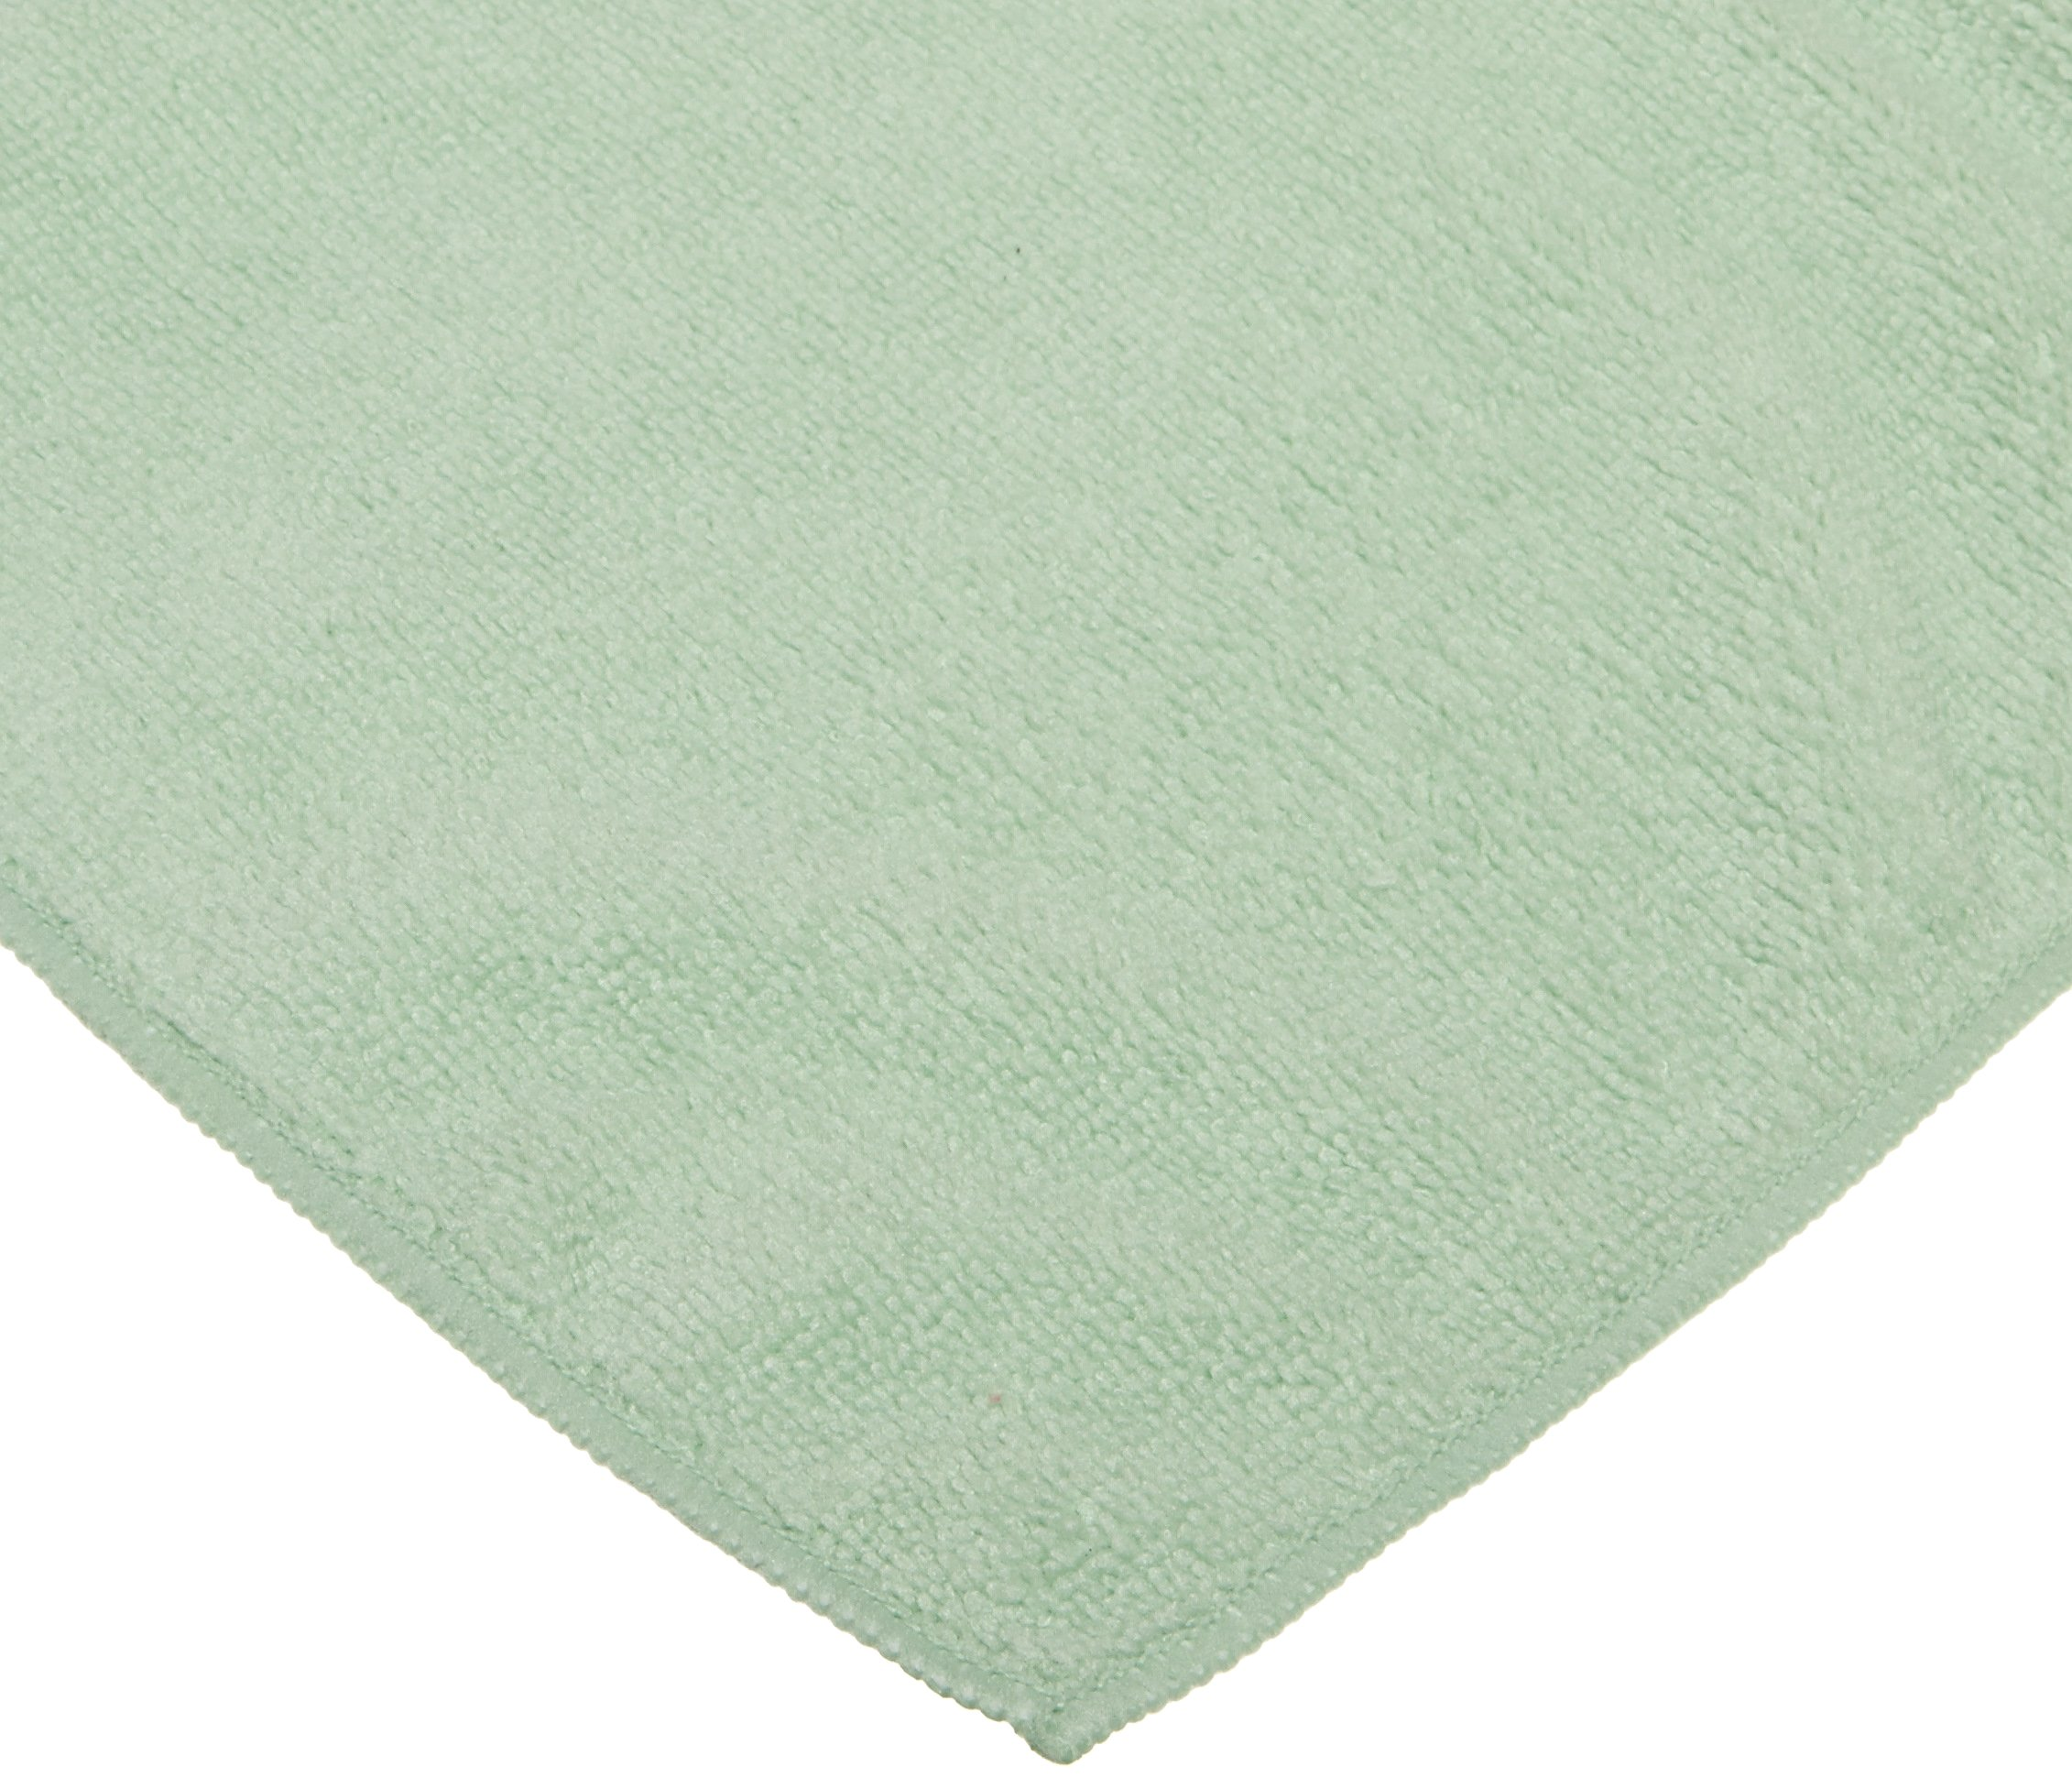 CPI MCLOTH G General Purpose Microfiber Cloth, 16-Inch x 16-Inch, Green (Pack of 12)